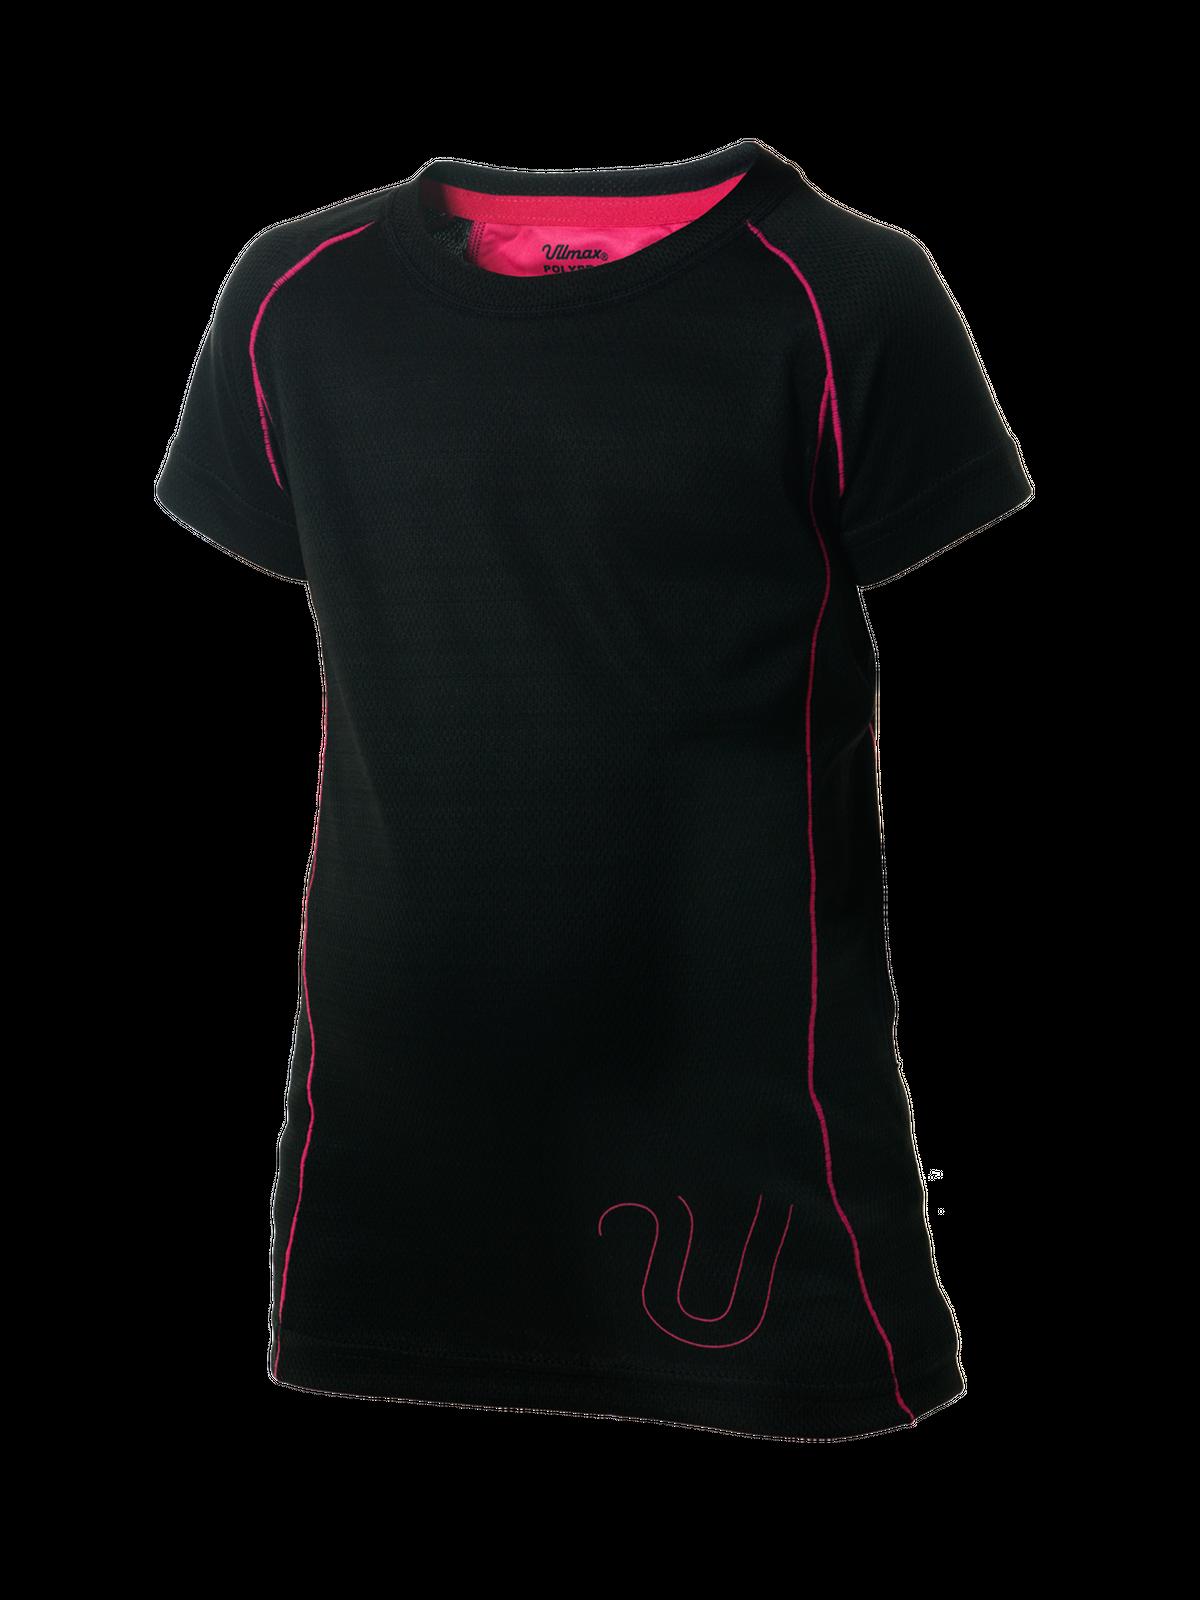 Polypro T-shirt Kid  Svart/Rosa